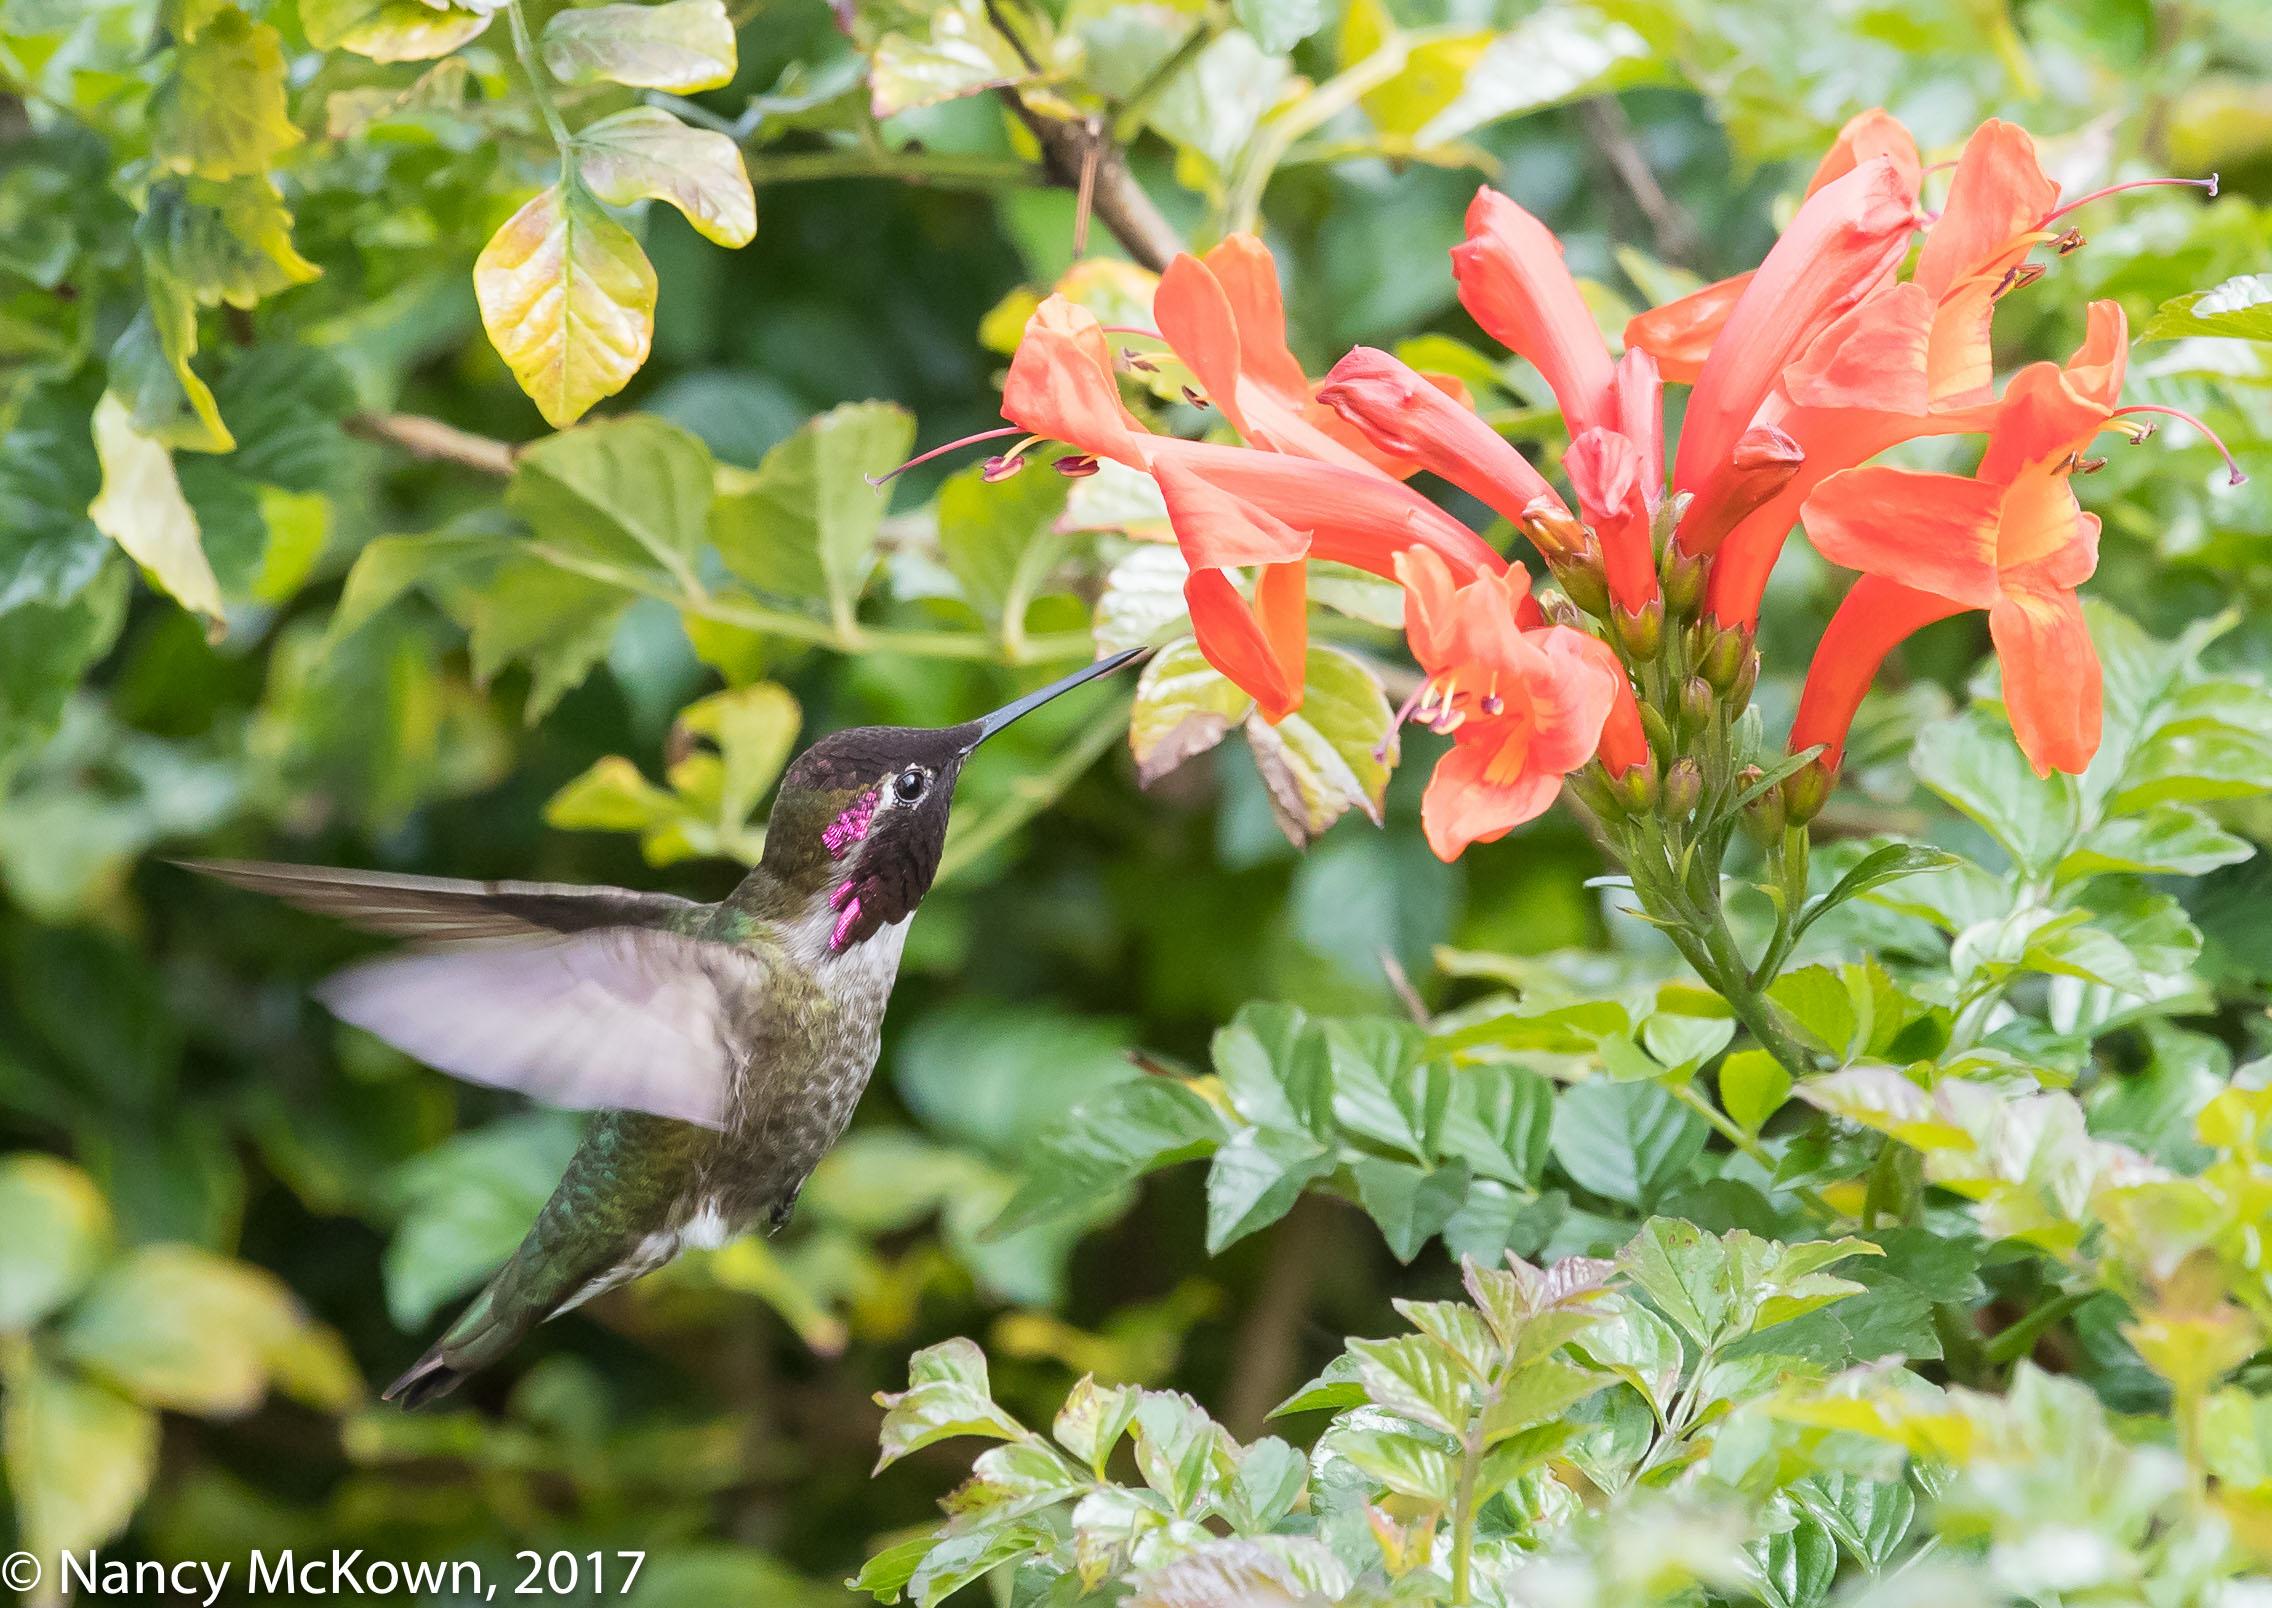 Photograph of Anna's Hummingbird